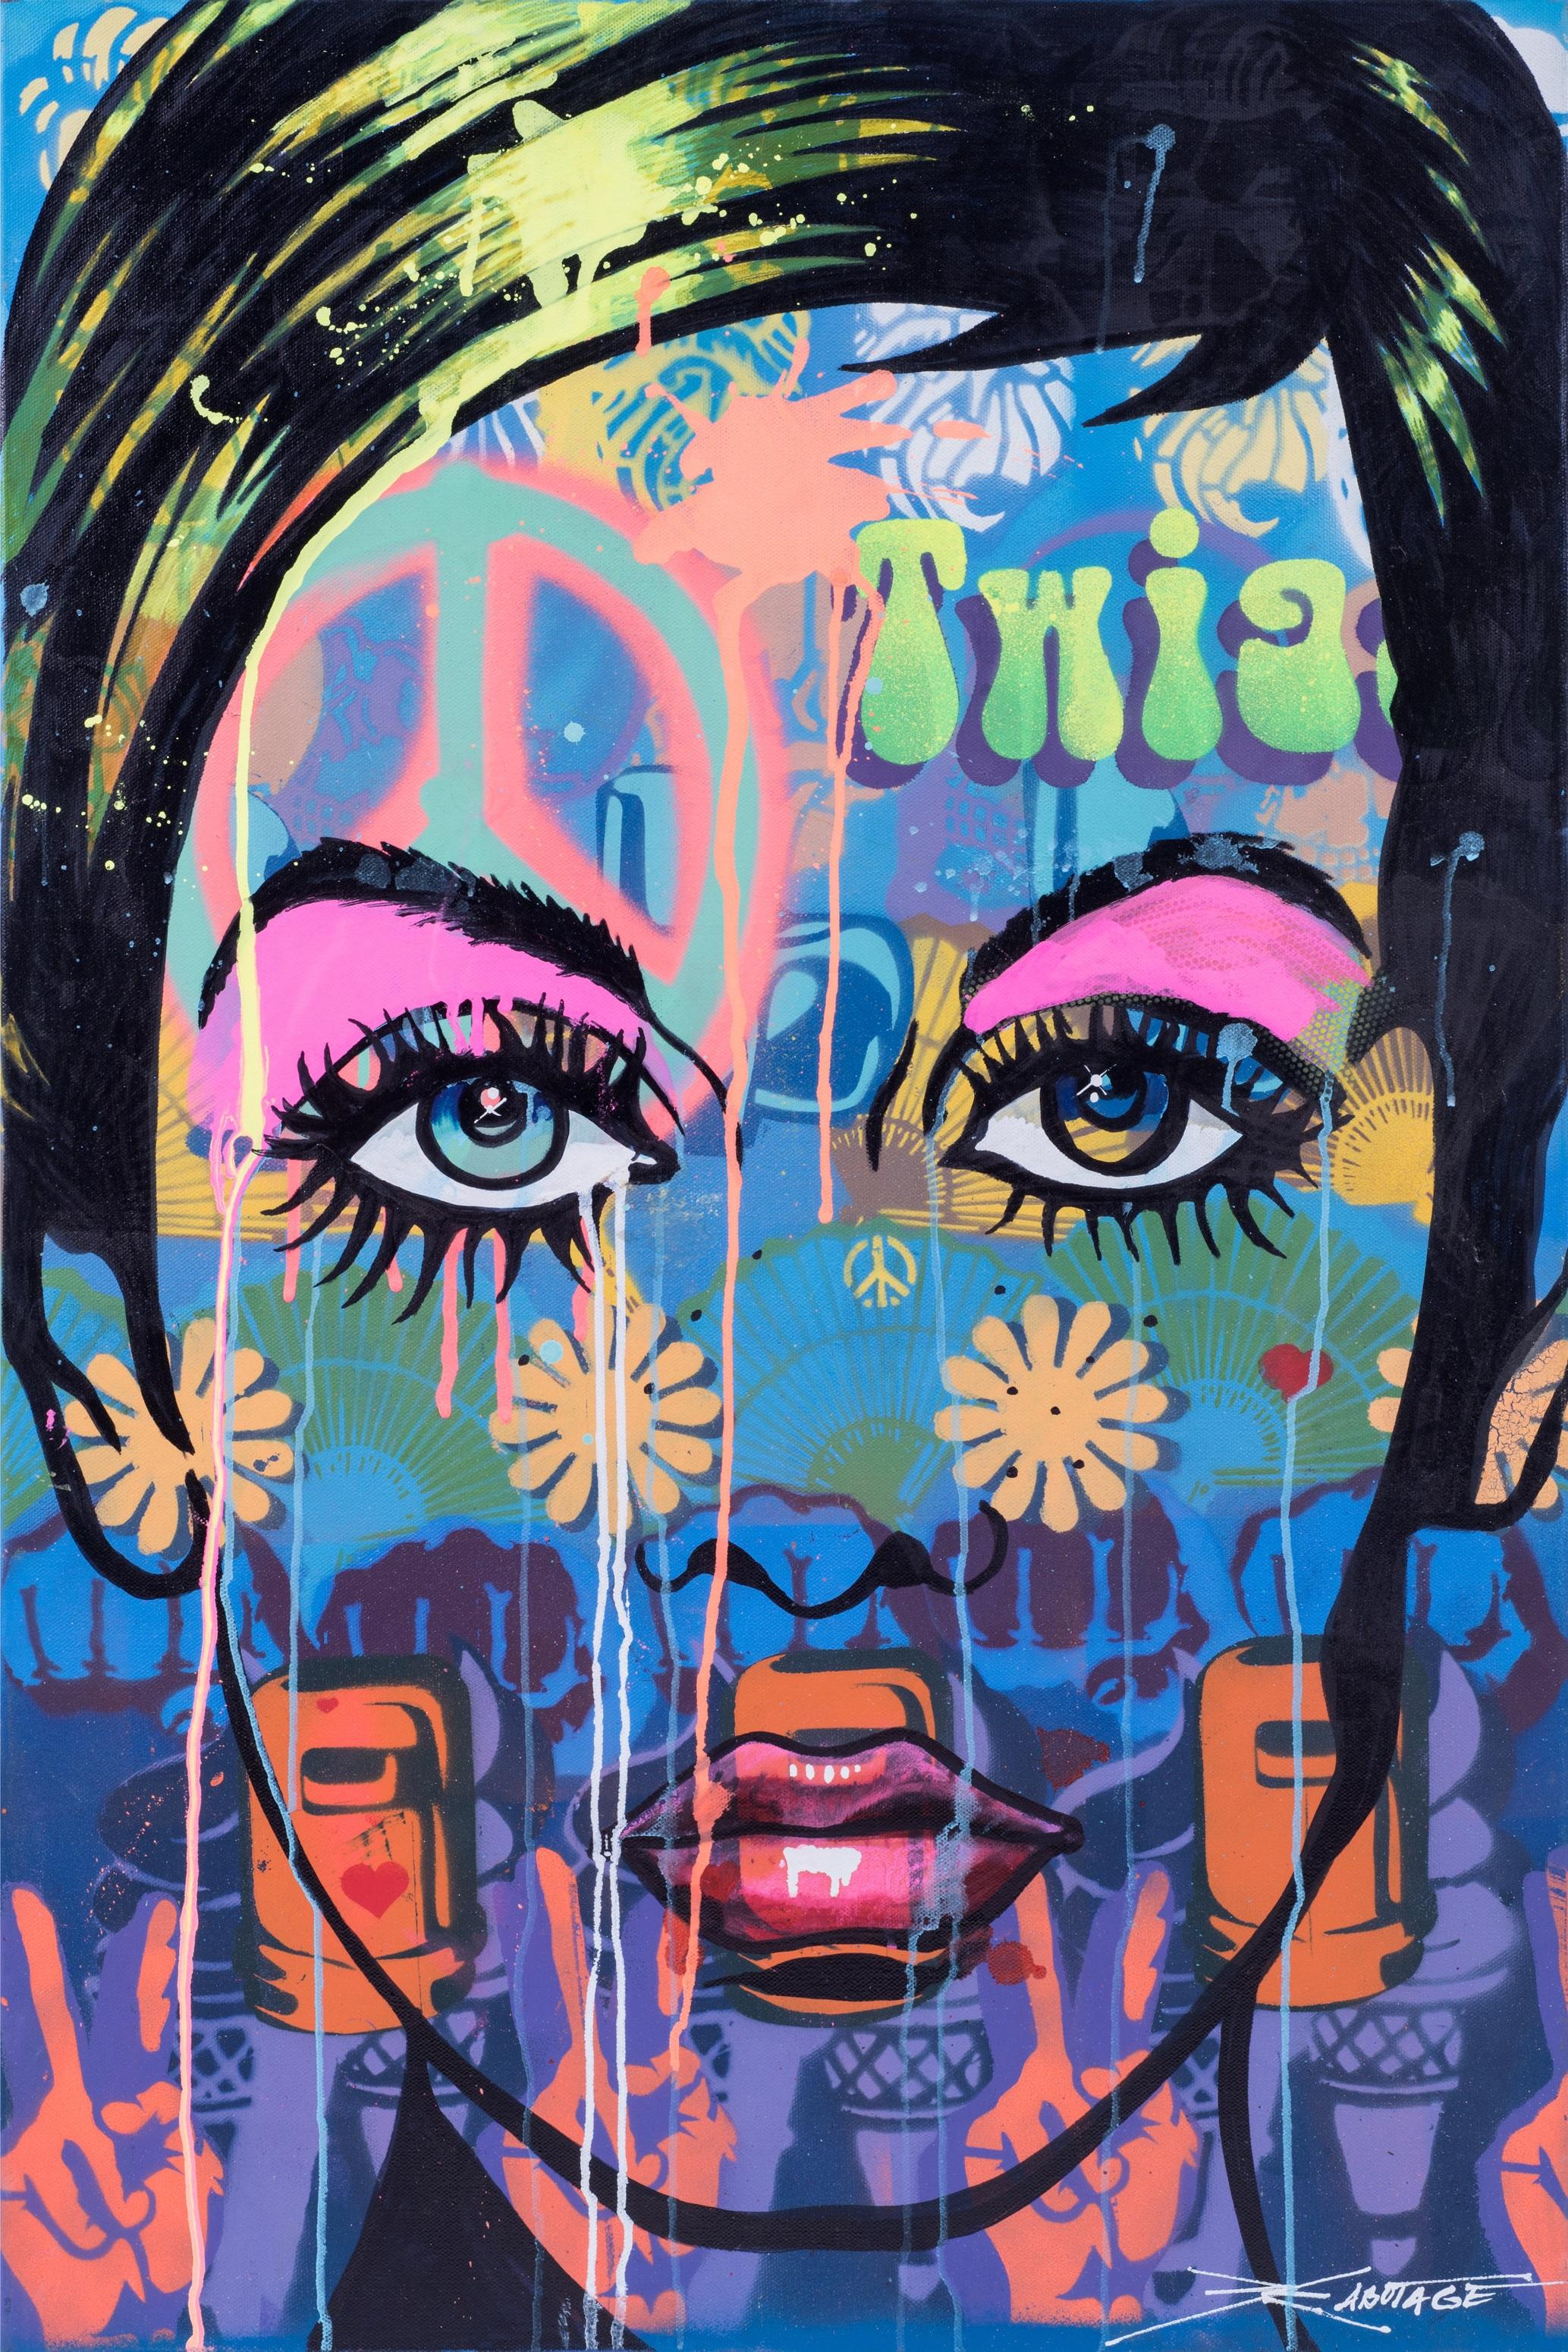 """Twiggy"" Spray Paint, Stencil and Graffiti Marker 61 x 91 x 4 cm 2017"